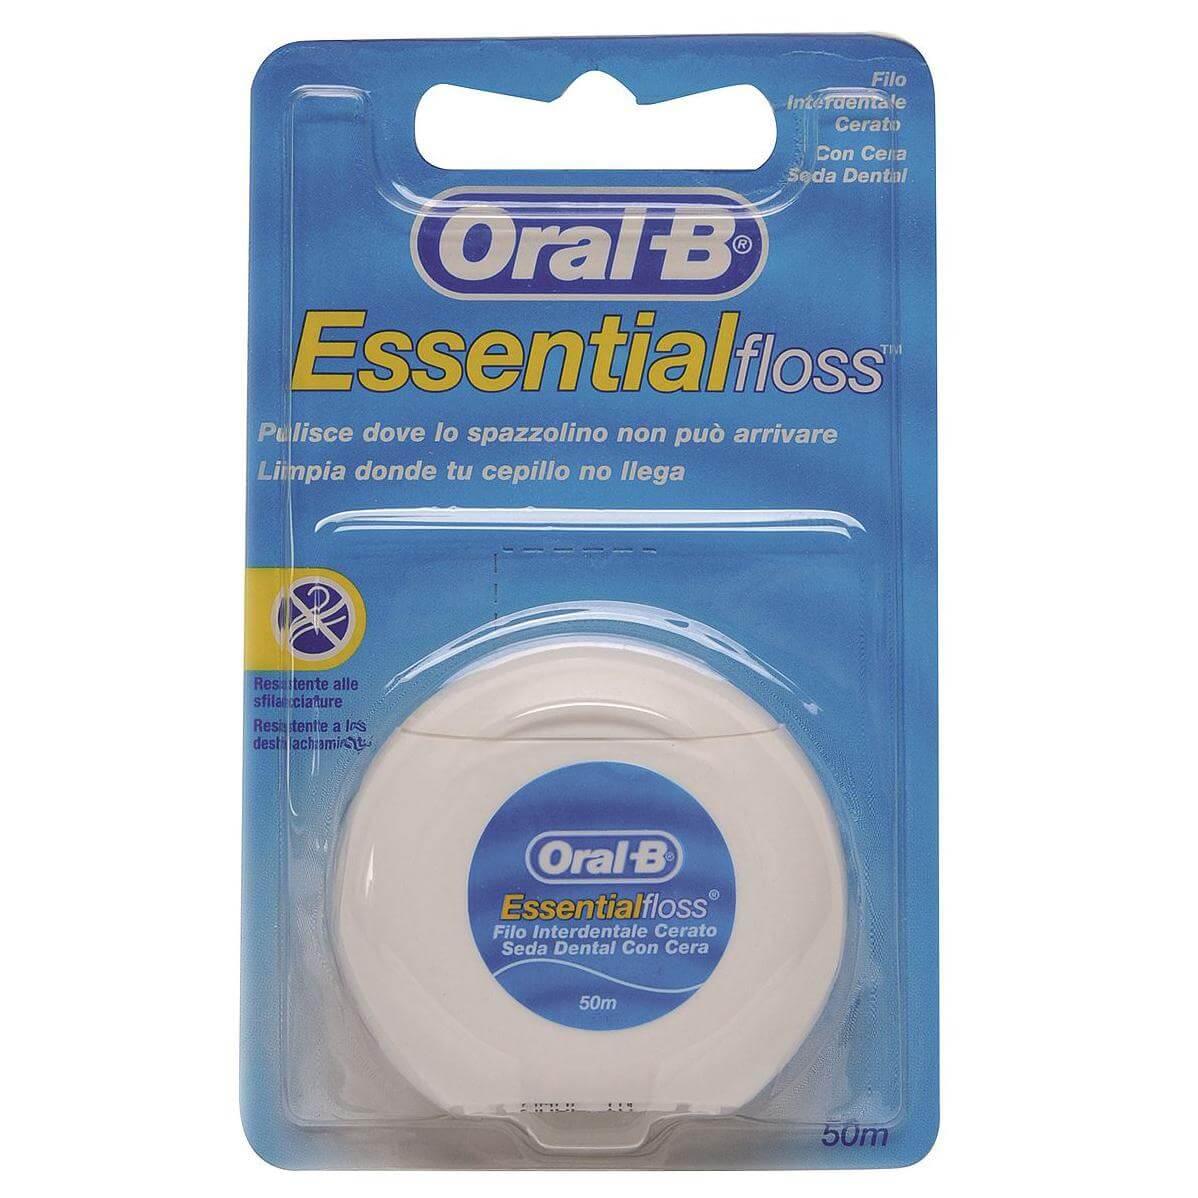 Oral-B Essential Floss Κηρωμένο Οδοντικό Νήμα 50m